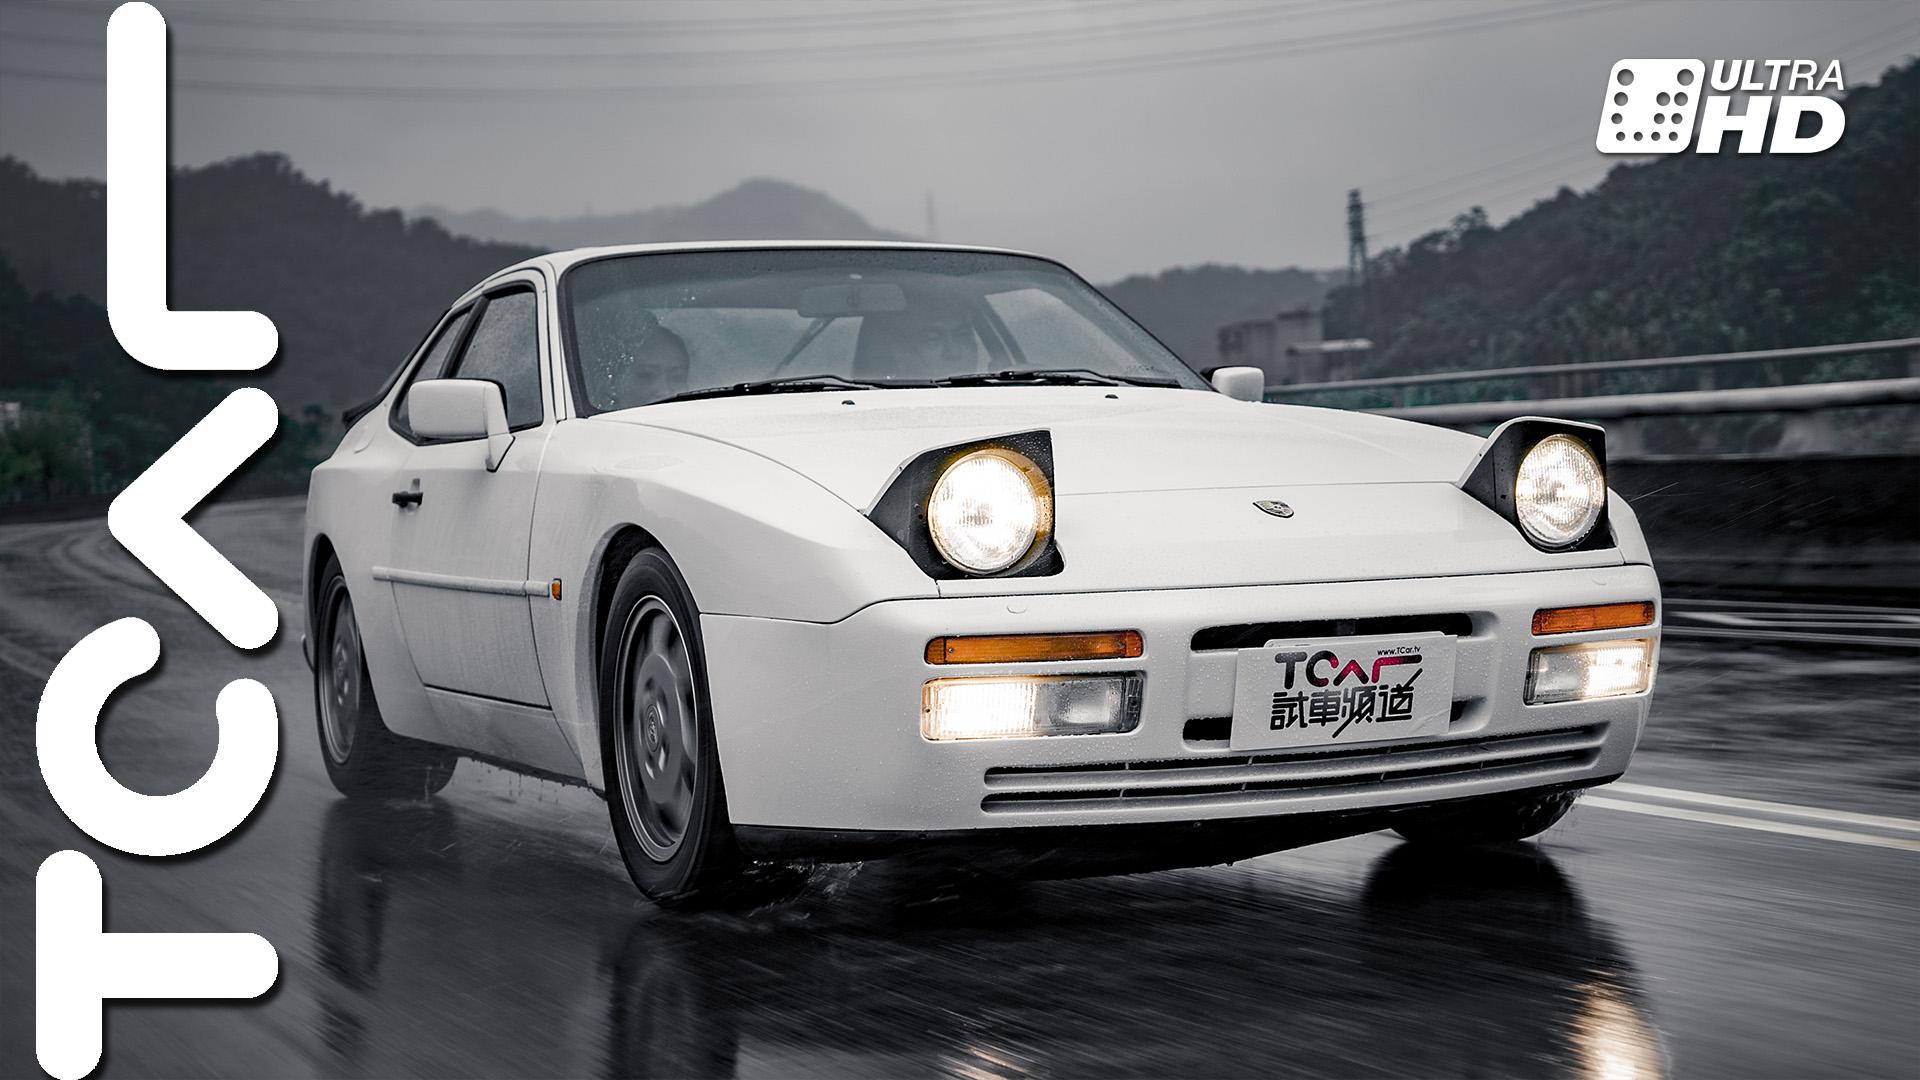 TCar 2週年特輯 Porsche 944 S2 老青蛙遊雙北 特別企劃 - TCAR